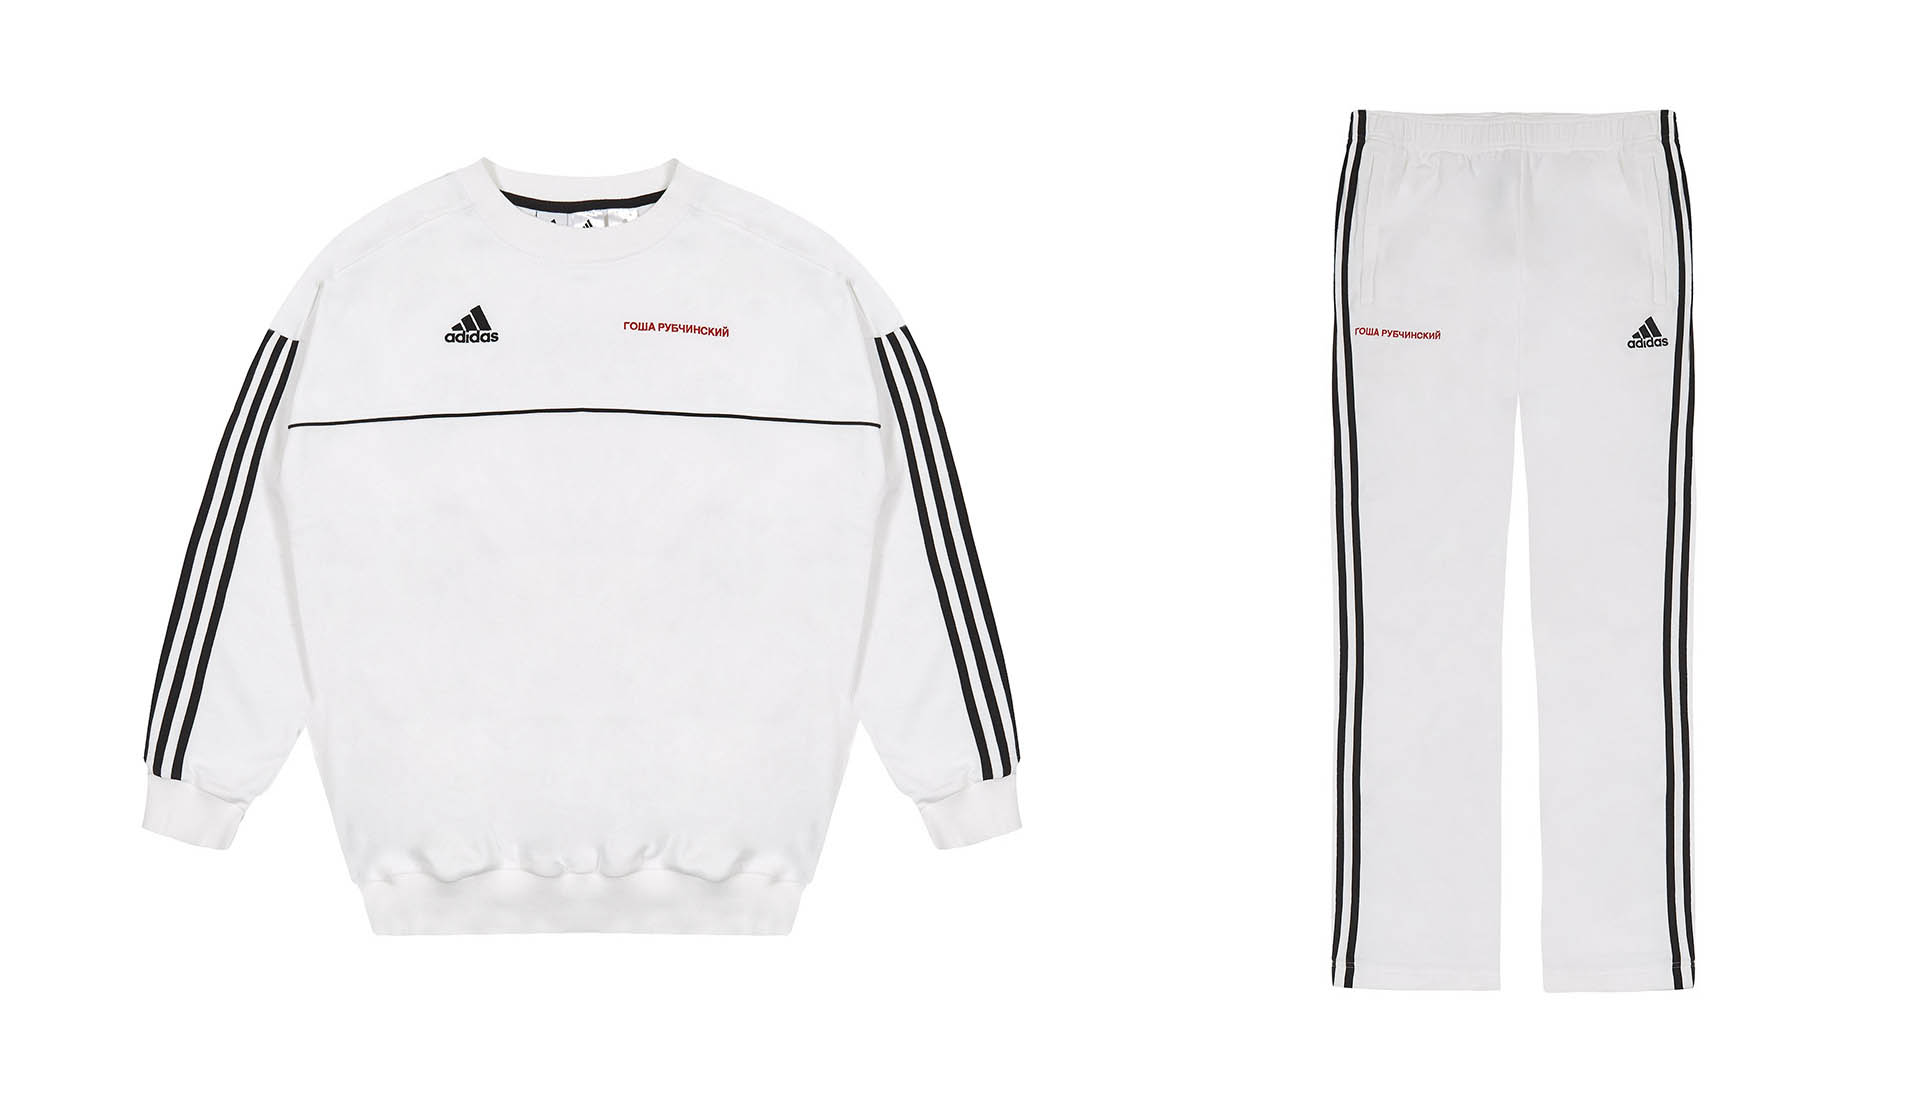 Gosha Rubchinskiy x adidas Second FW17 collection SoccerBible